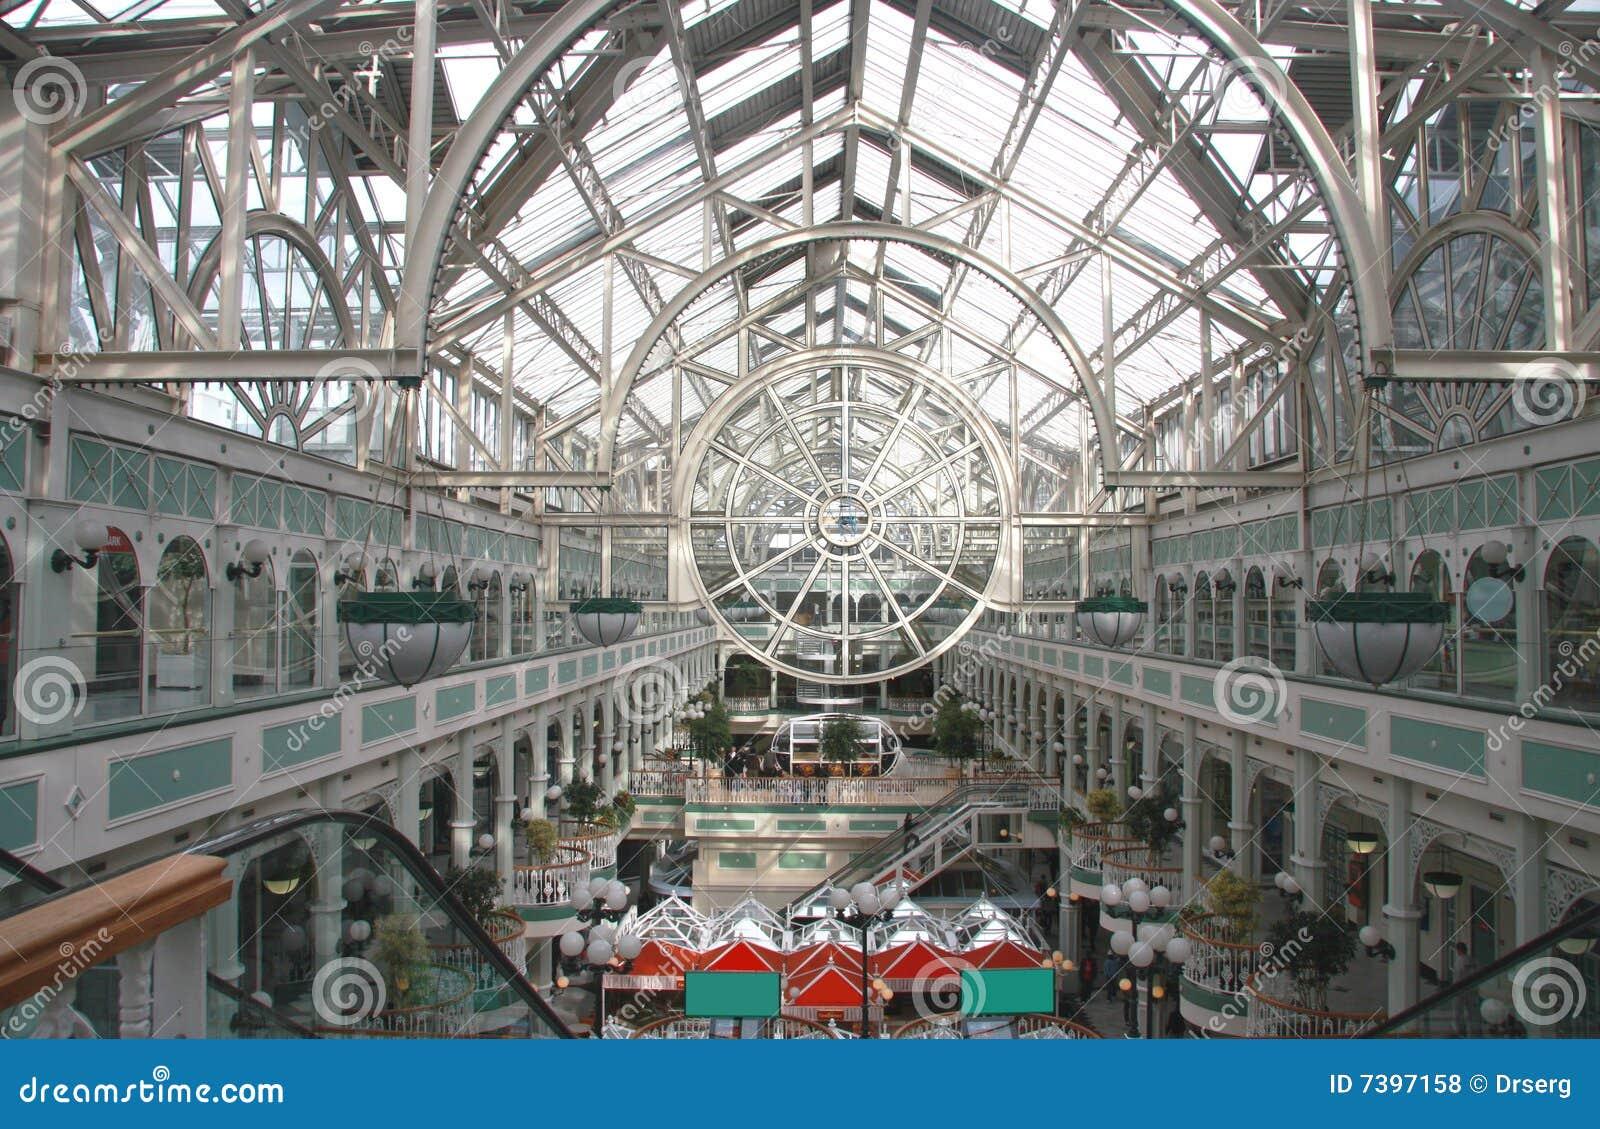 Centro comercial de Dublín con la azotea transparente